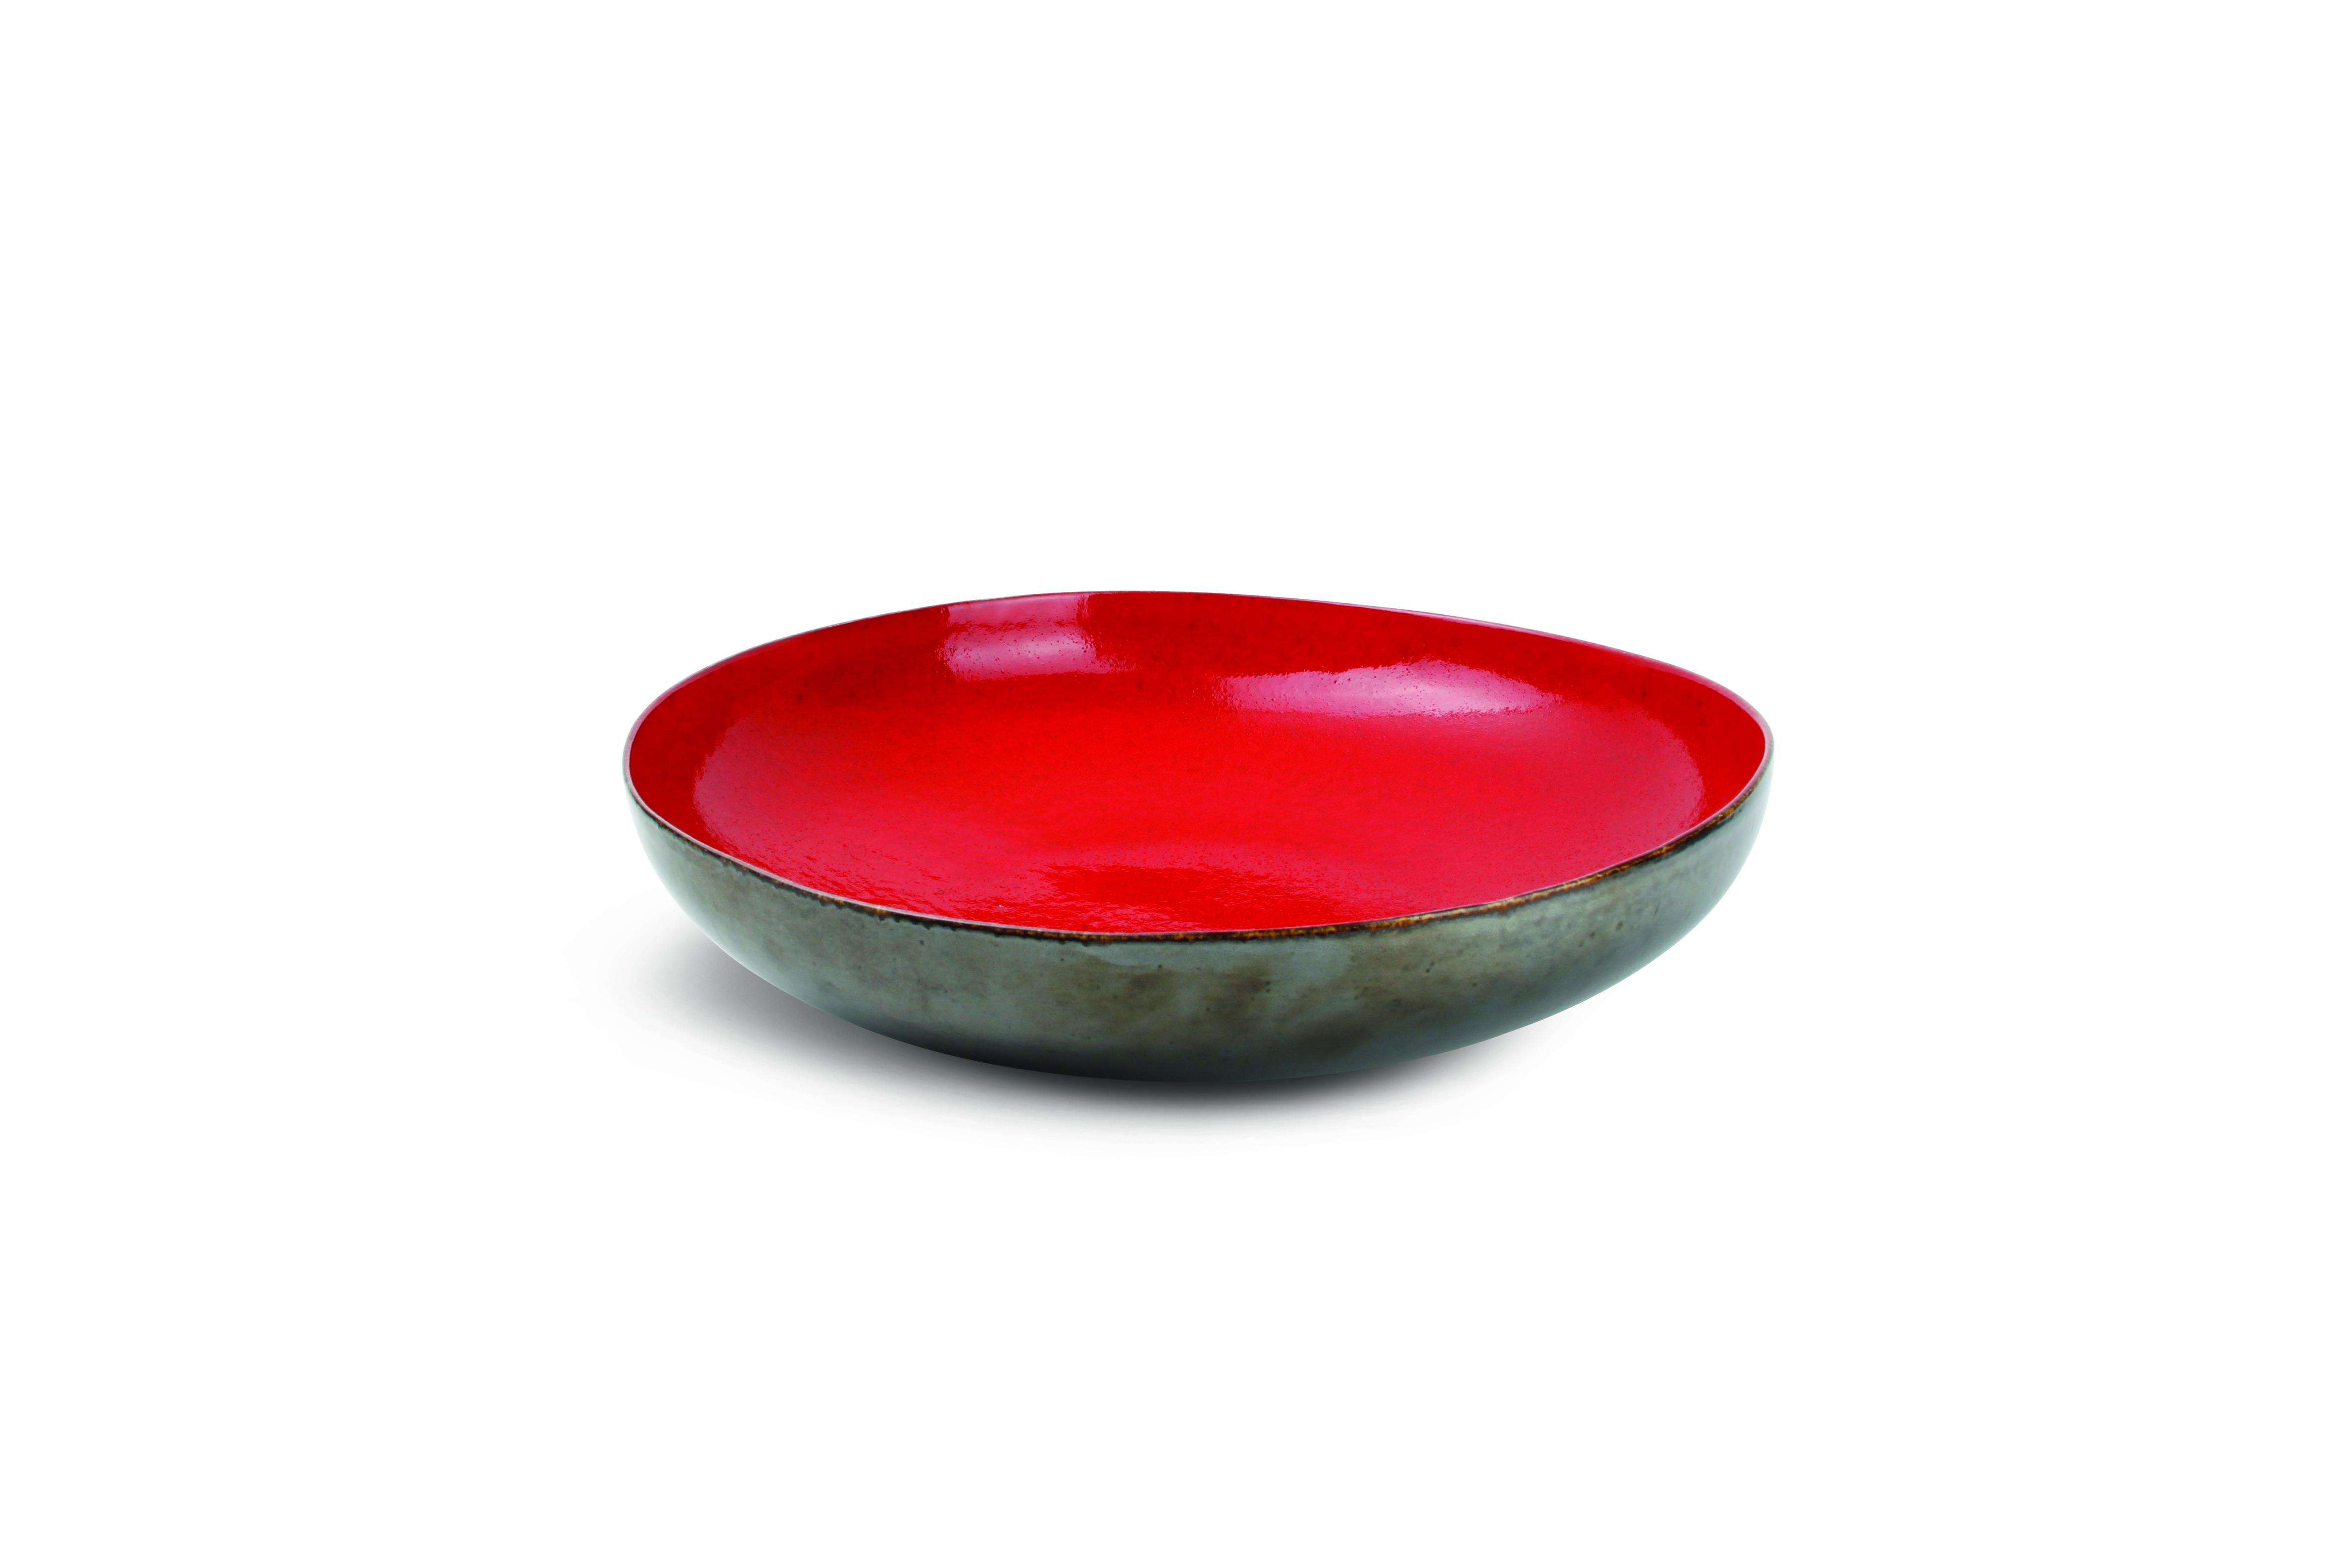 Buffetschaal rond 36 cm, 8.5 hoog, rood/zilver Chic